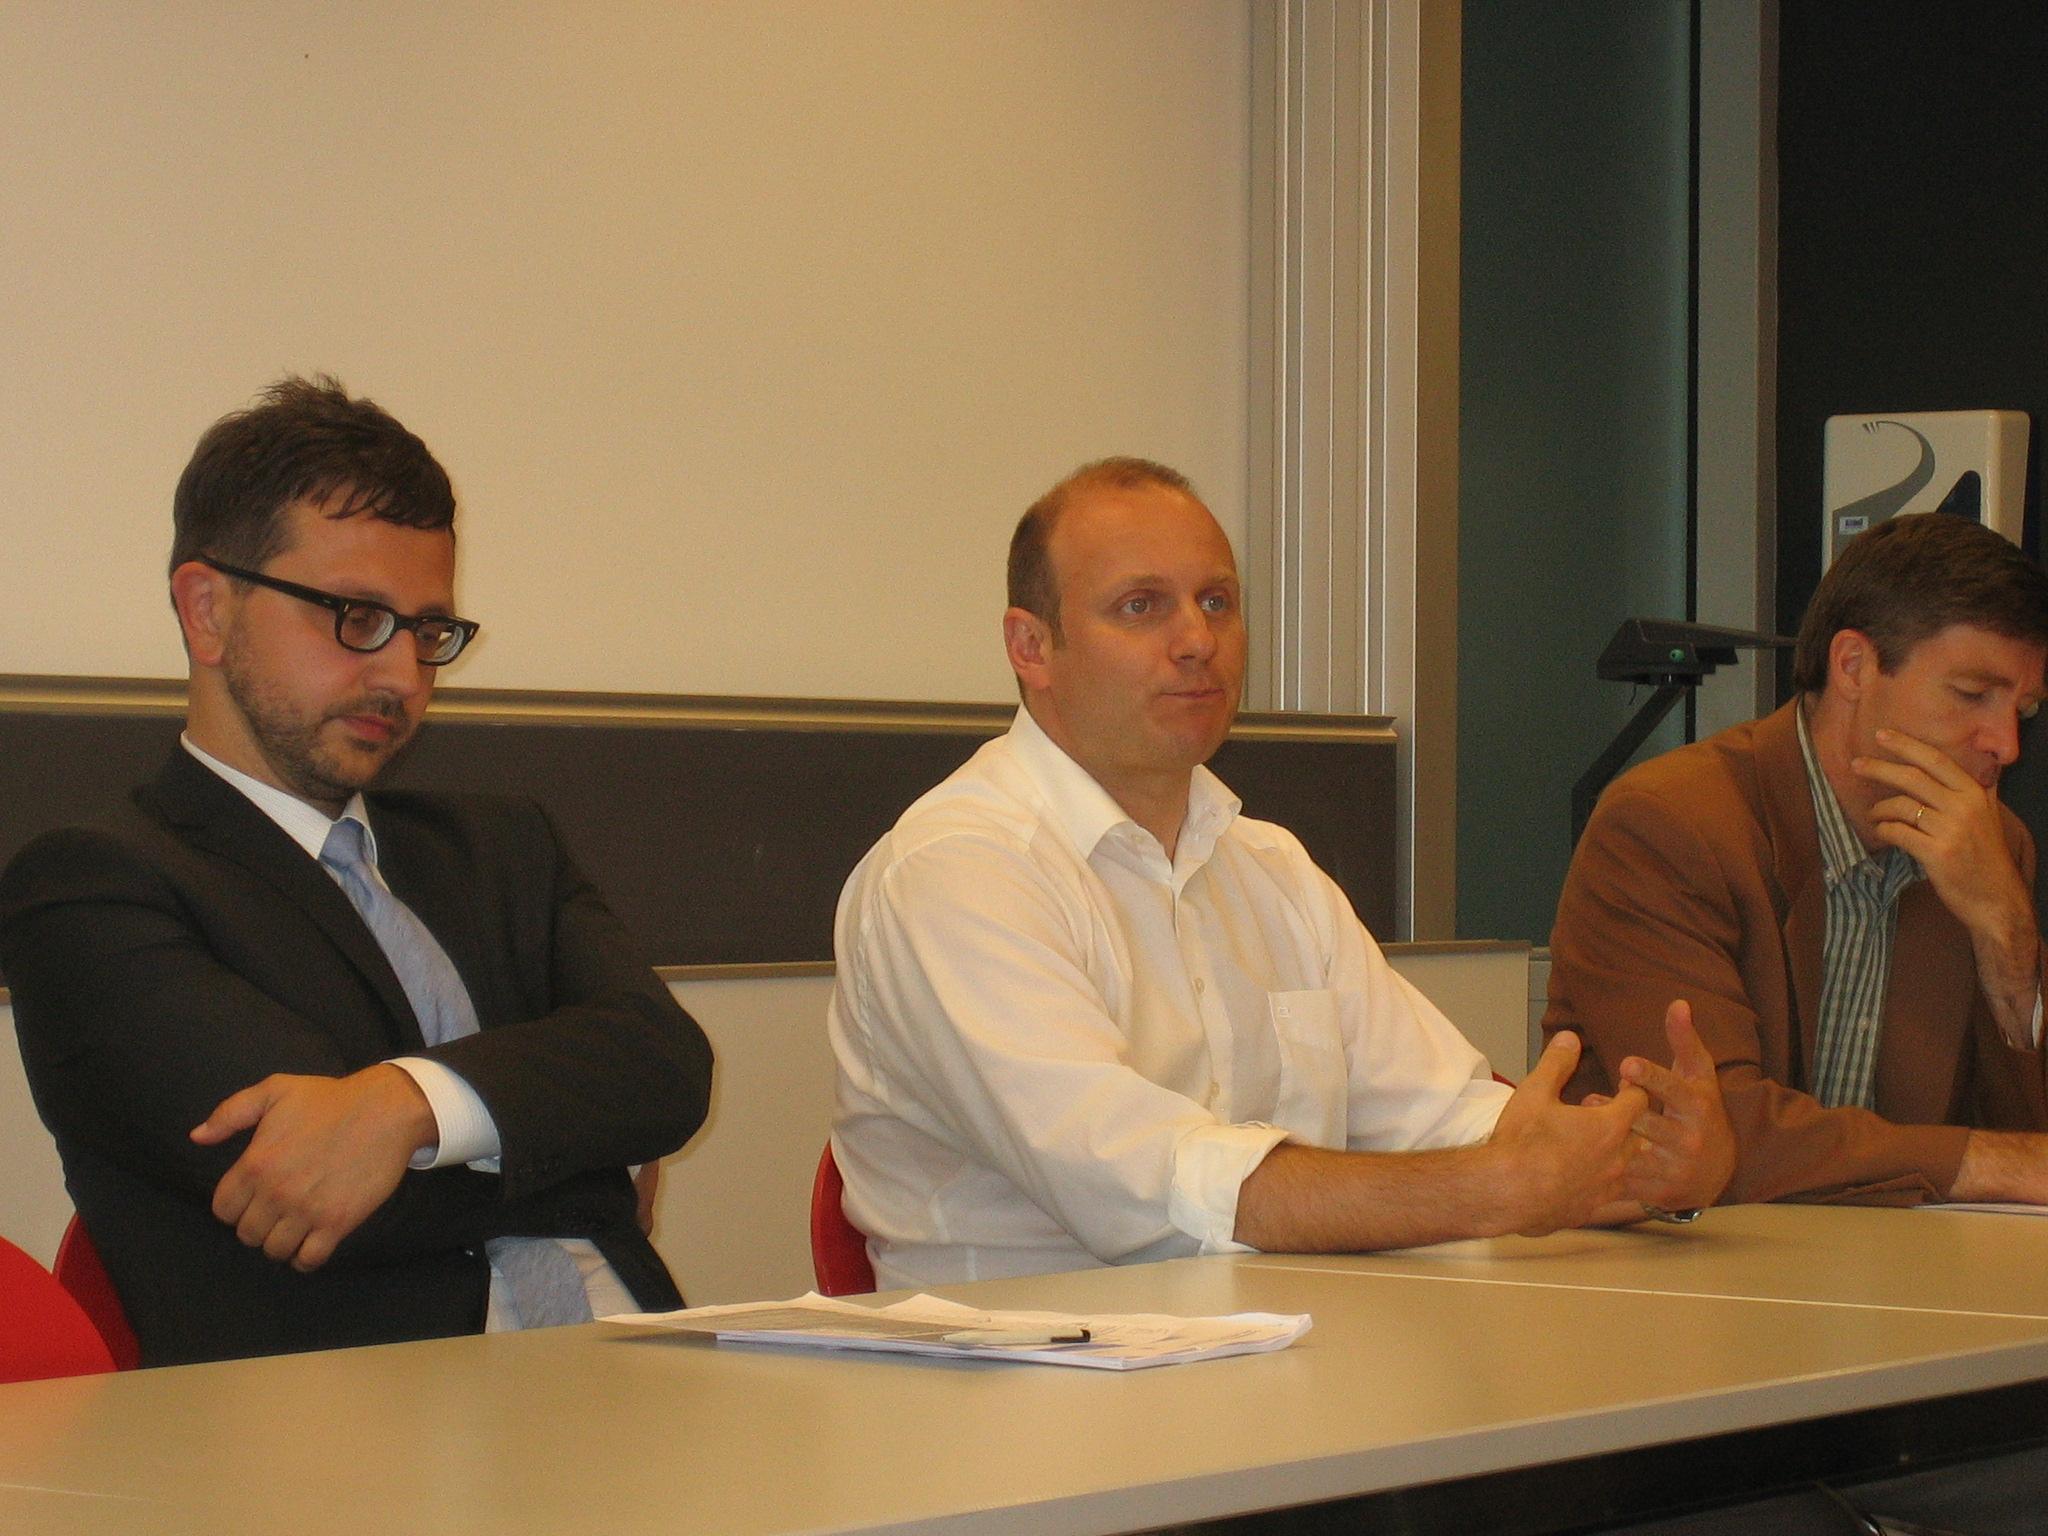 Marco Salvi, François Yenny et Philippe Thalmann